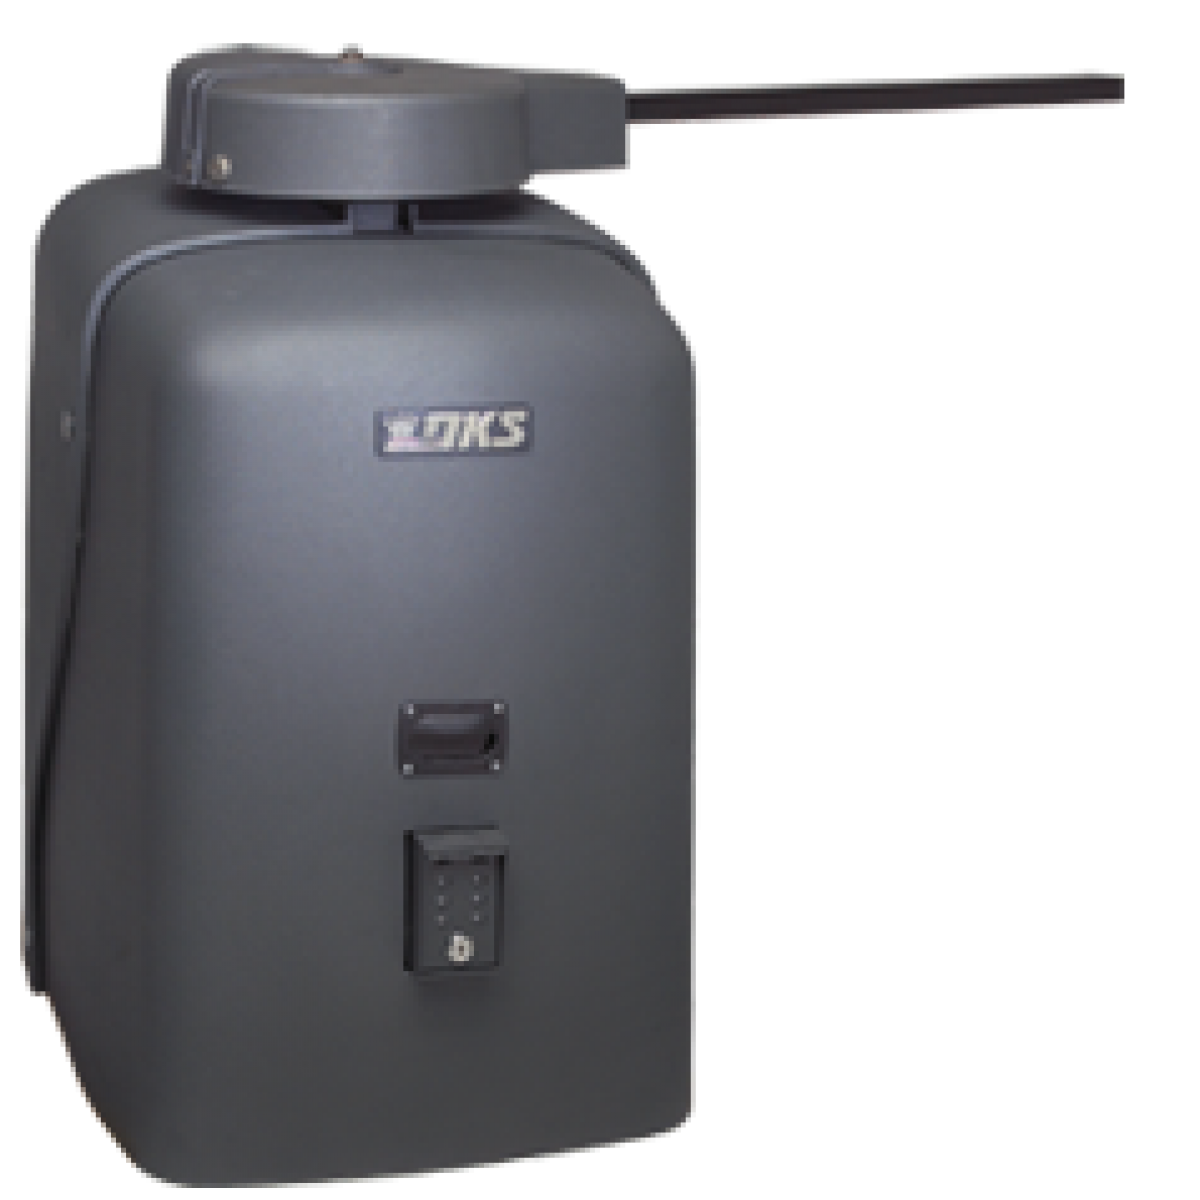 Dks Doorking 6550 080 1 Hp Swing Gate Operator Operators Opener And Radio Control Transmitter Affordable Openers Garage Door Access Controls